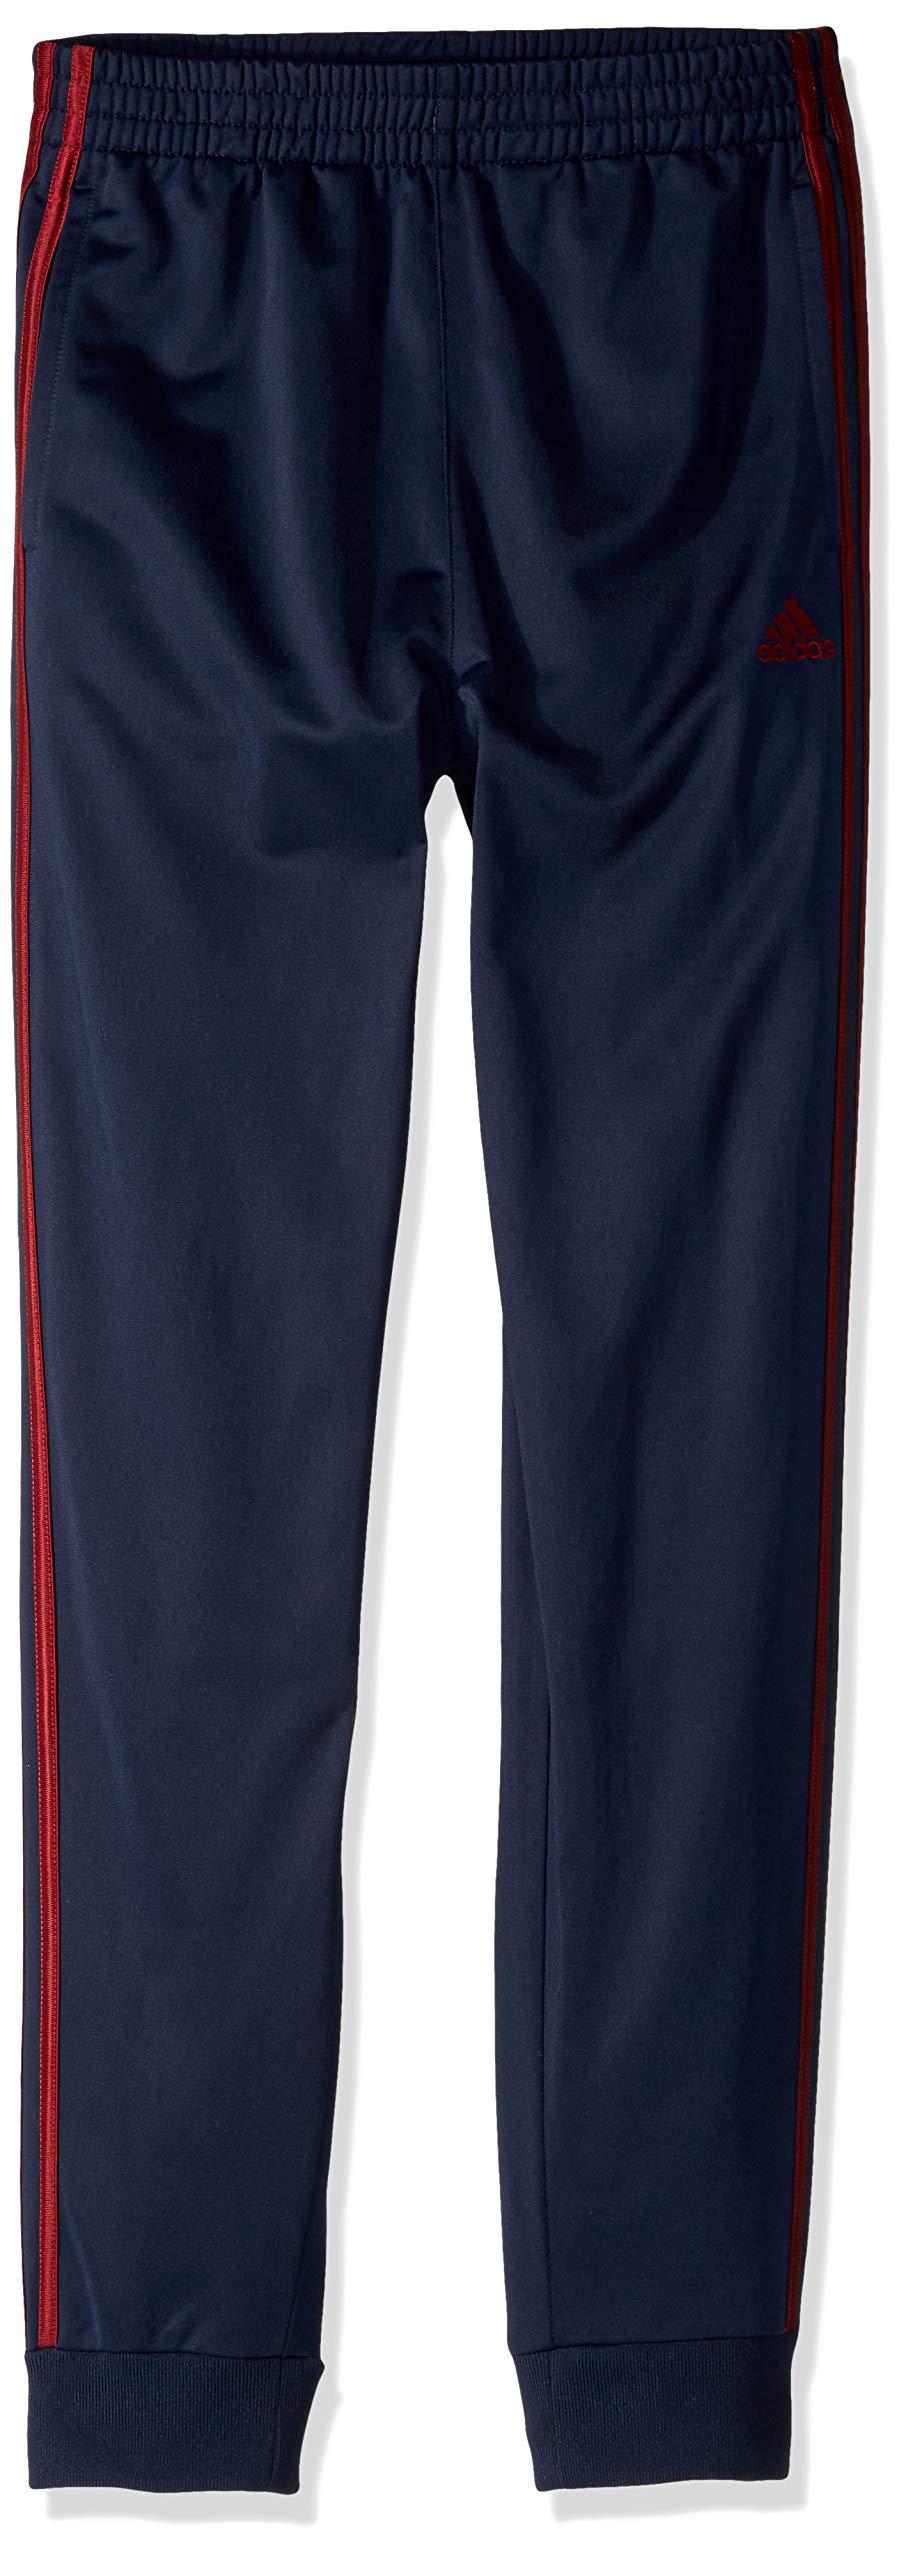 adidas Boys' Big Oldschool Jogger Pant, Dark Navy OS, L (14/16)